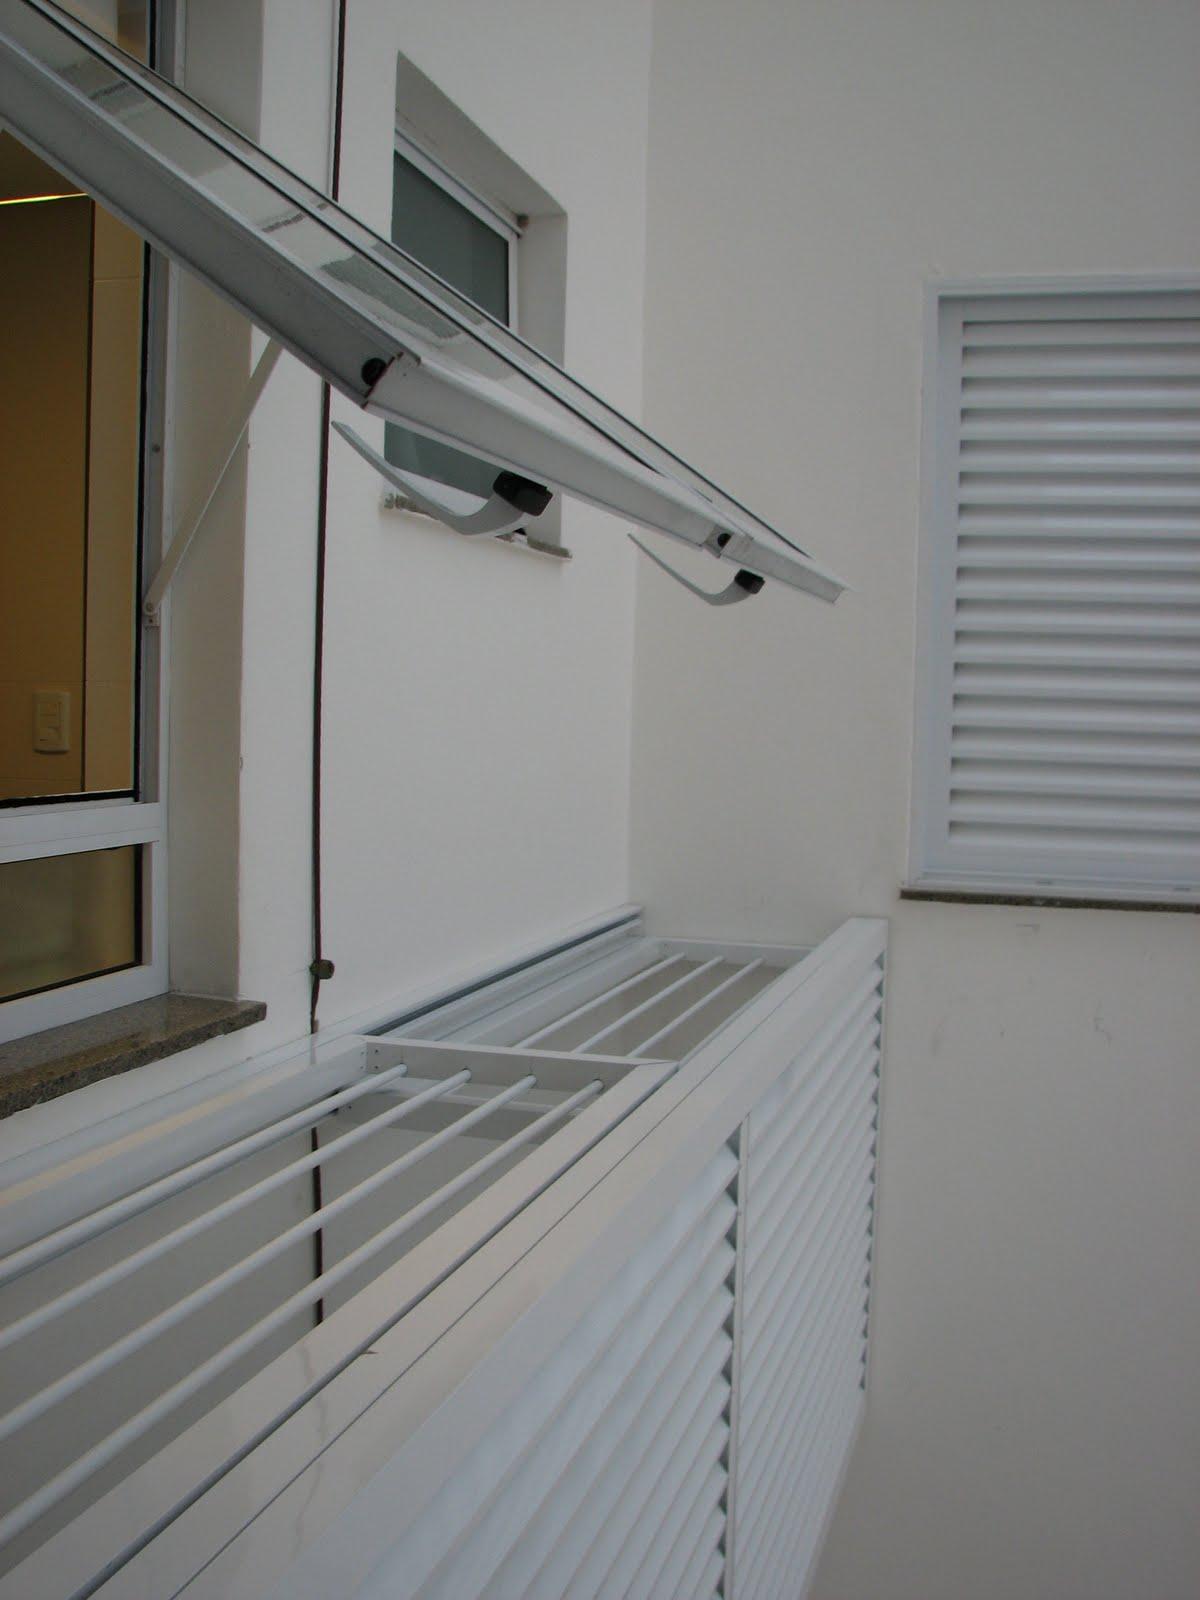 charles crippa speck arquitetura: varal e lavanderia #5D4B30 1200 1600